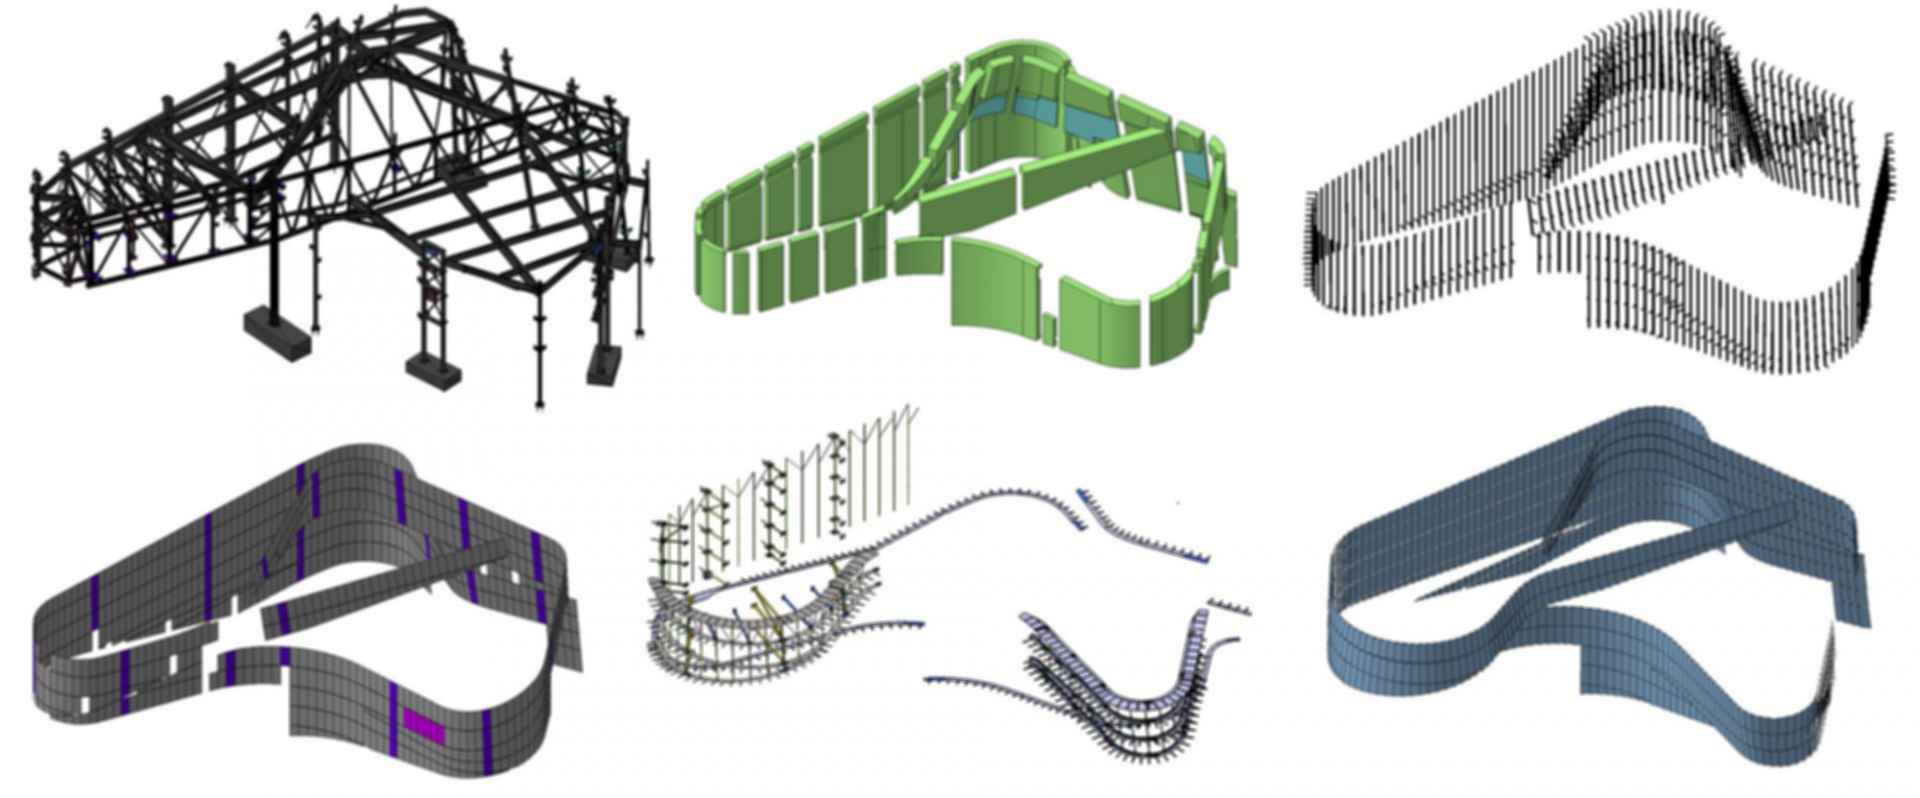 Dr. A.H. McCoy Federal Building - Concept Design